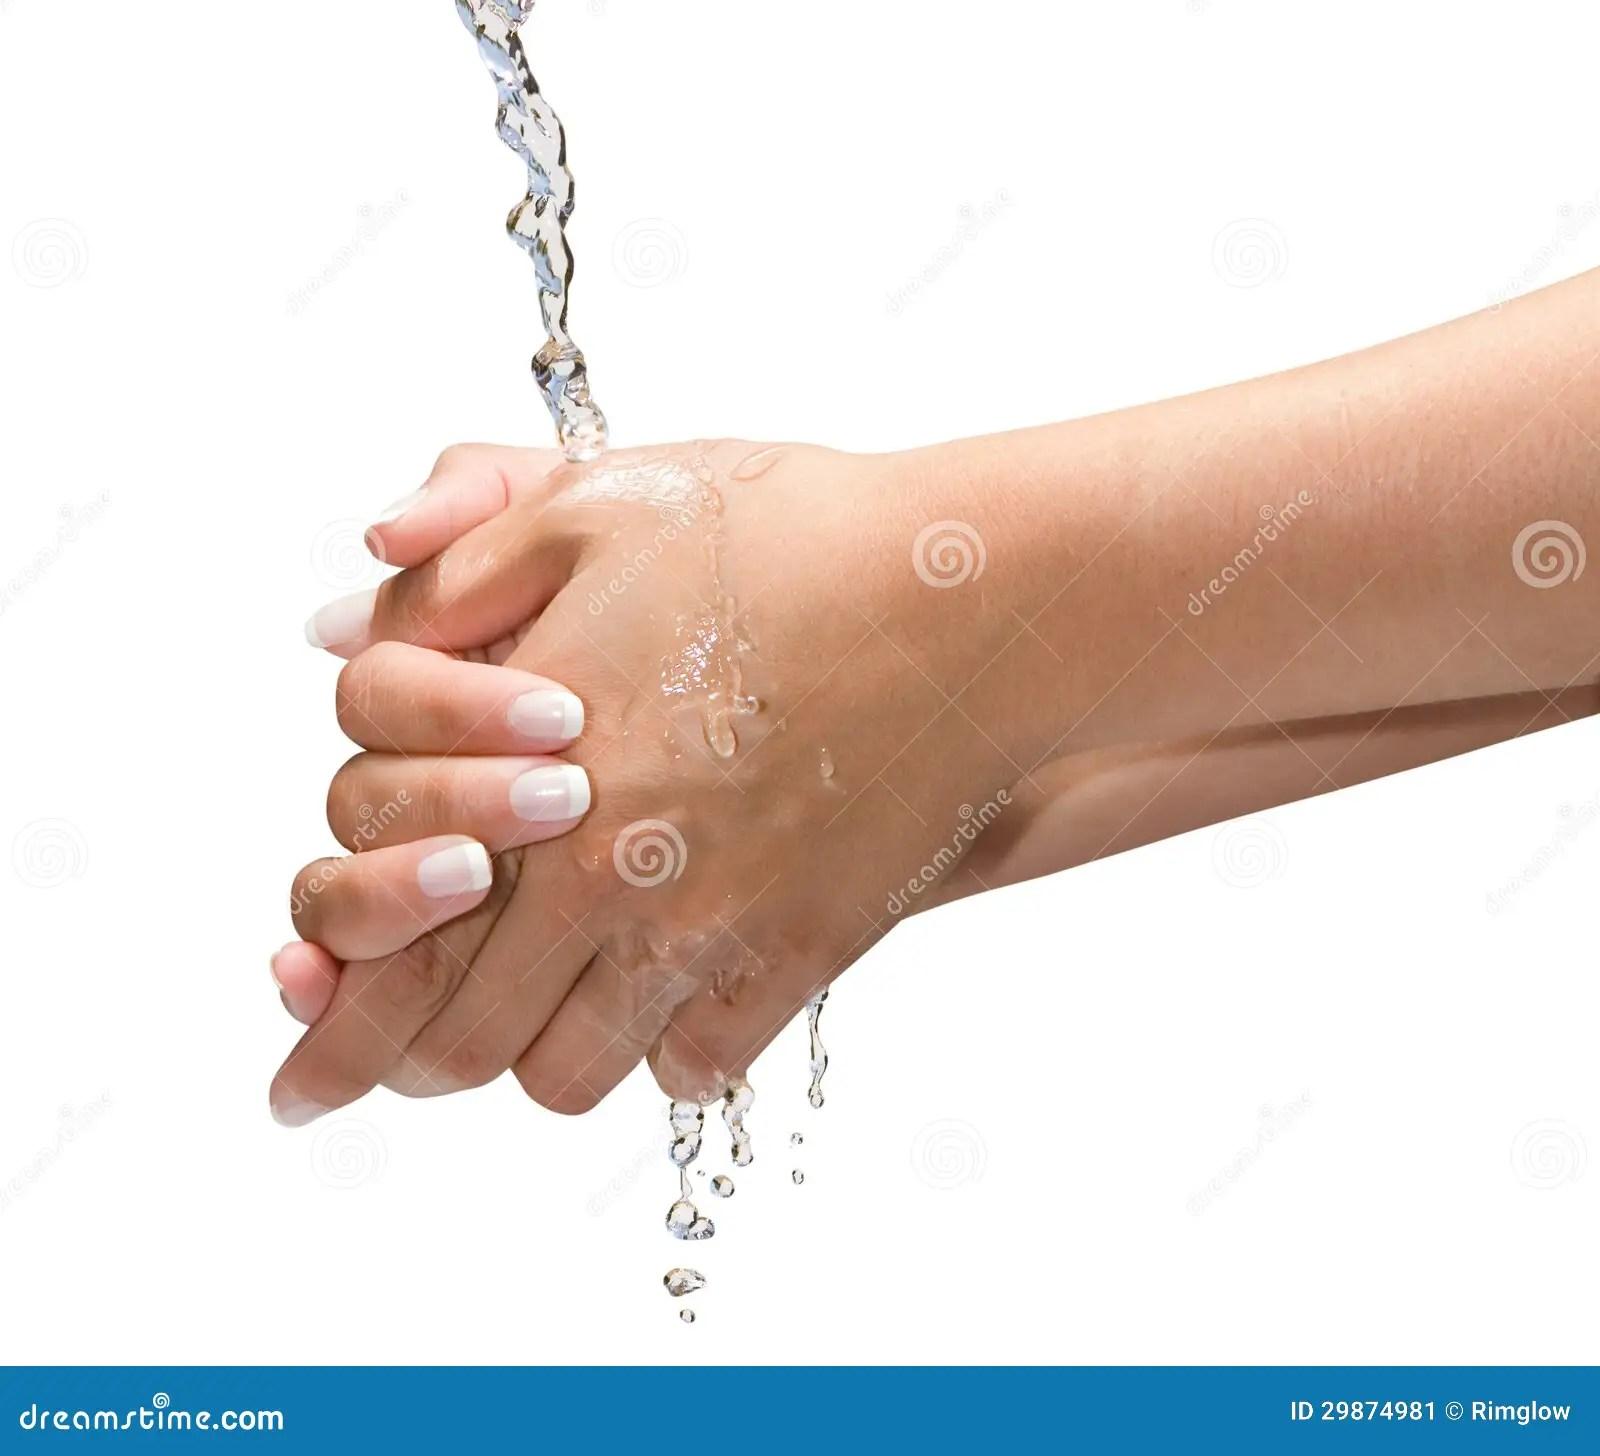 Washing Hands Isolated Stock Image